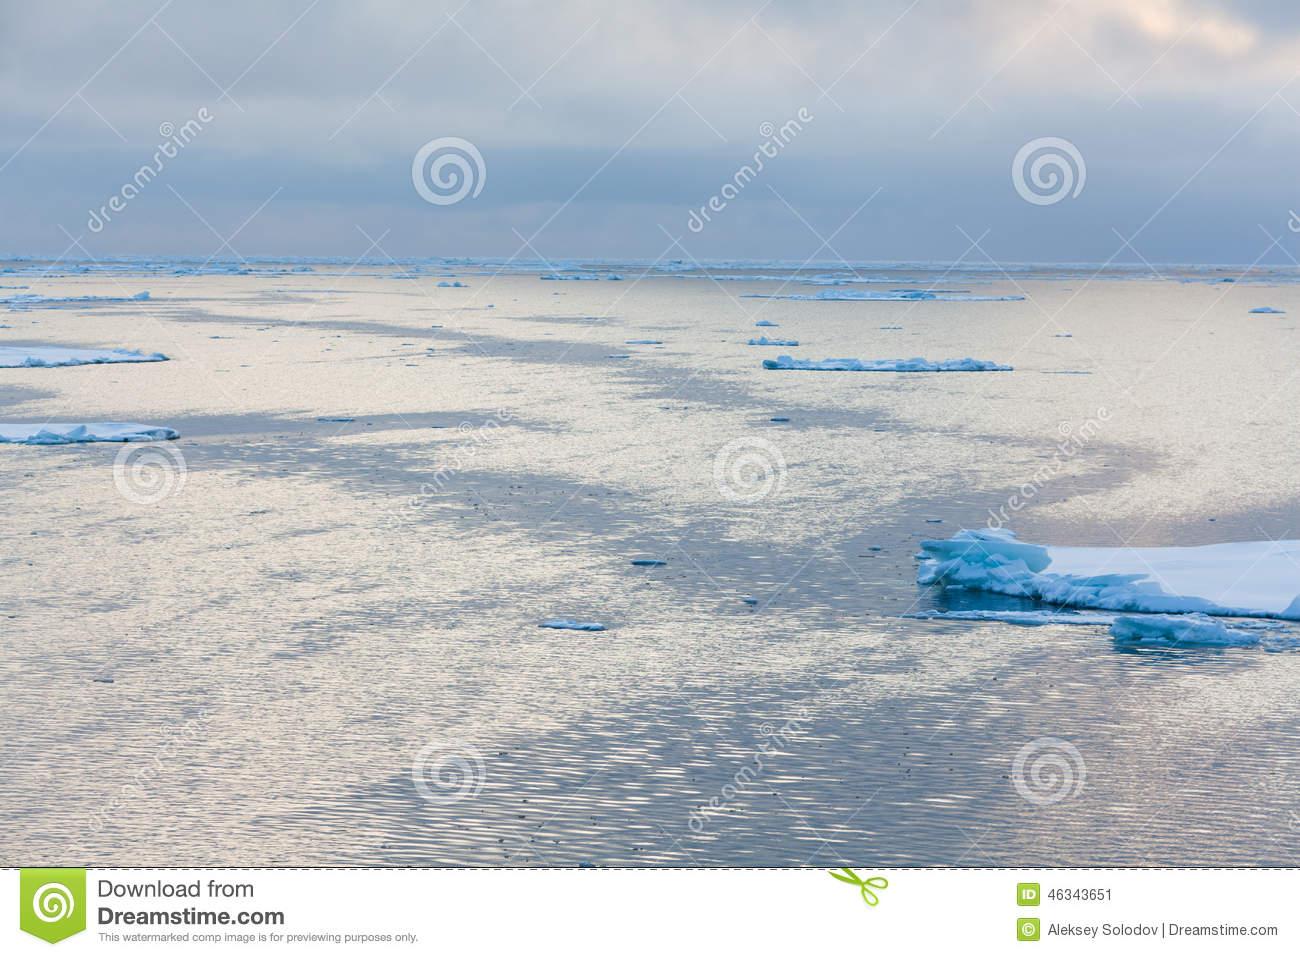 Laptev Sea Stock Photo.